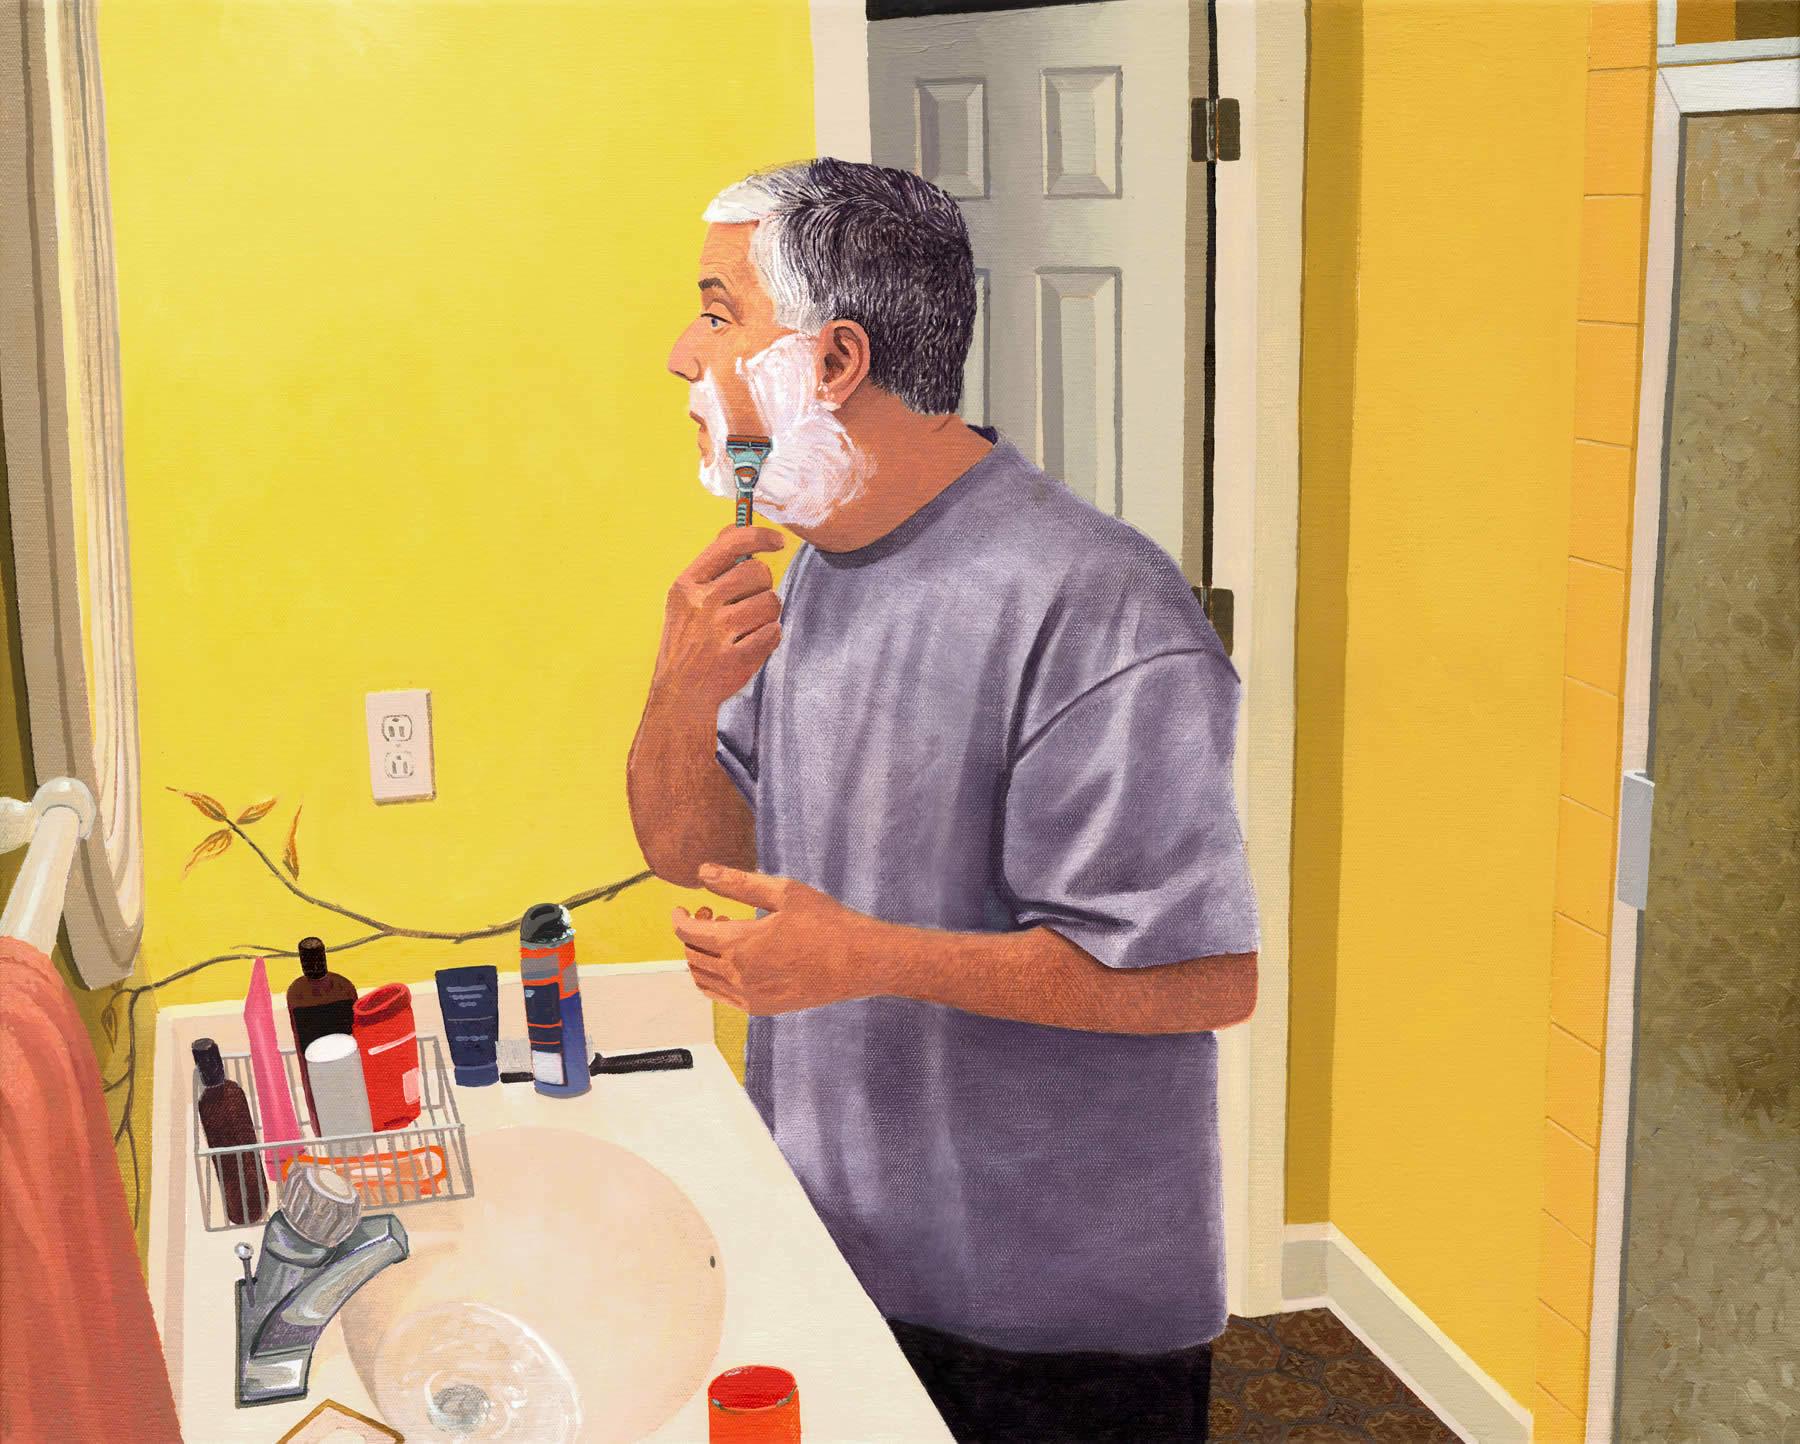 Portrait of My Dad Shaving